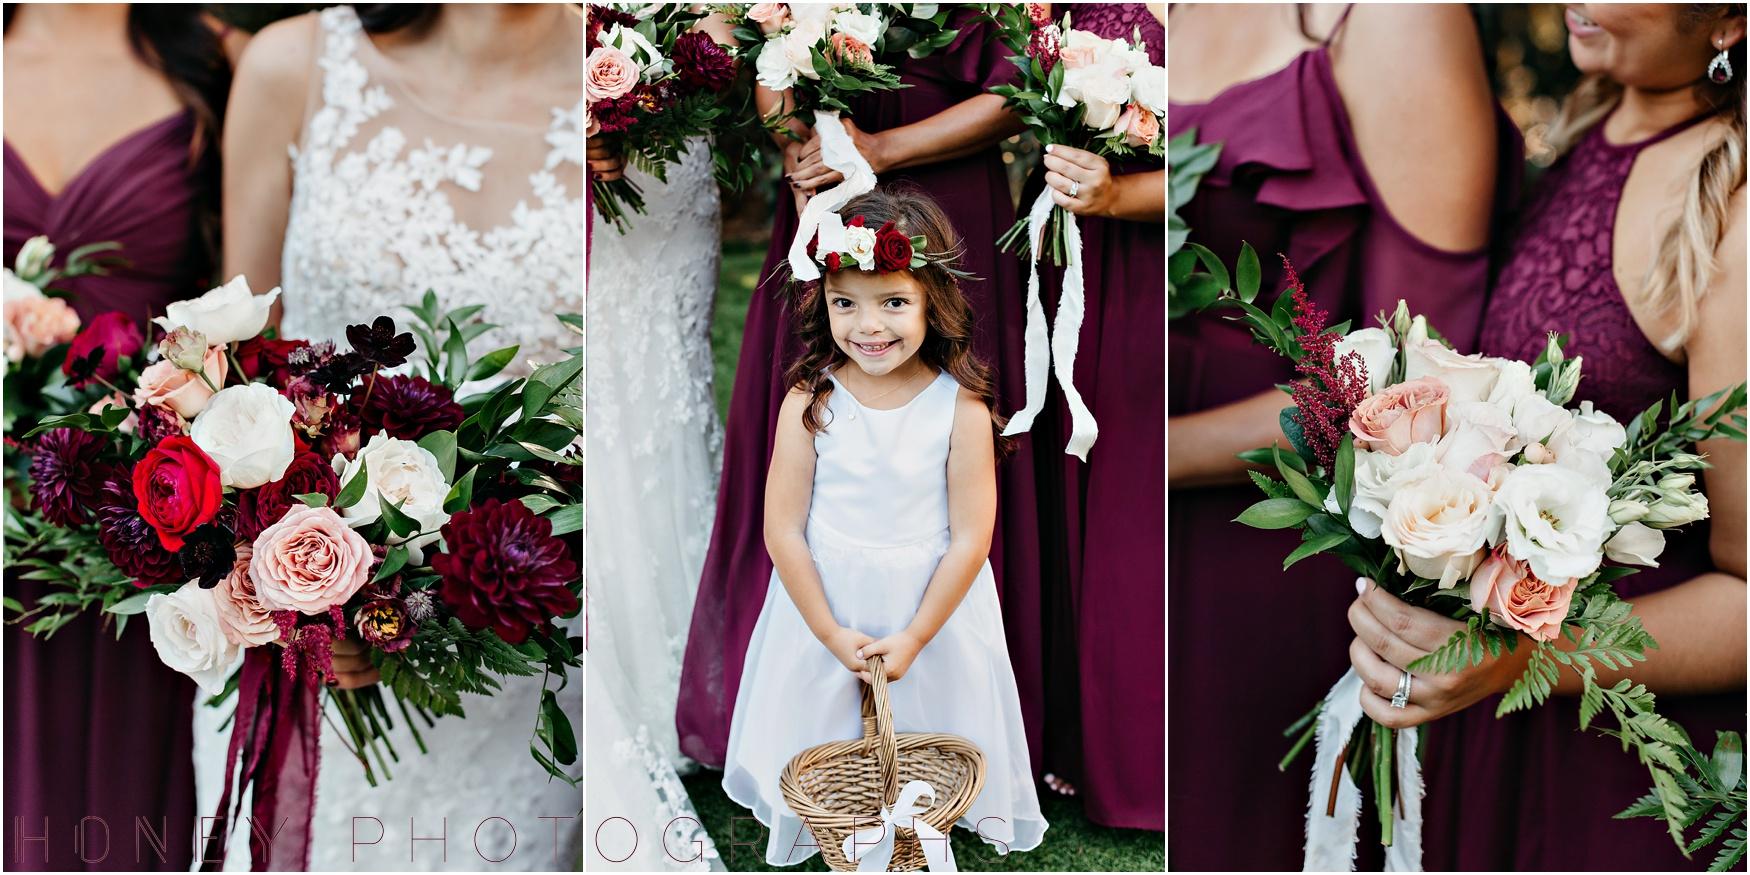 twin_oaks_garden_estate_fall_winter_burgundy_wedding010.jpg